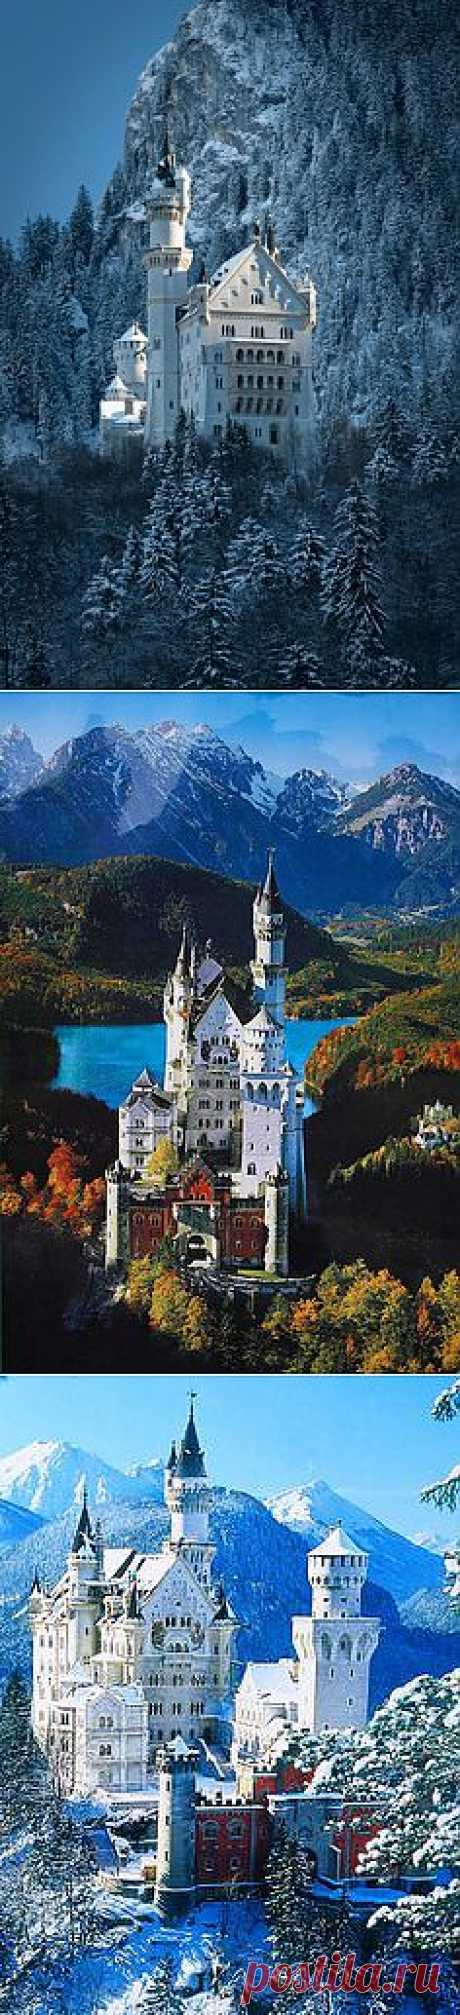 Neuschwanstein Castle, Bavaria, Germany | places I like